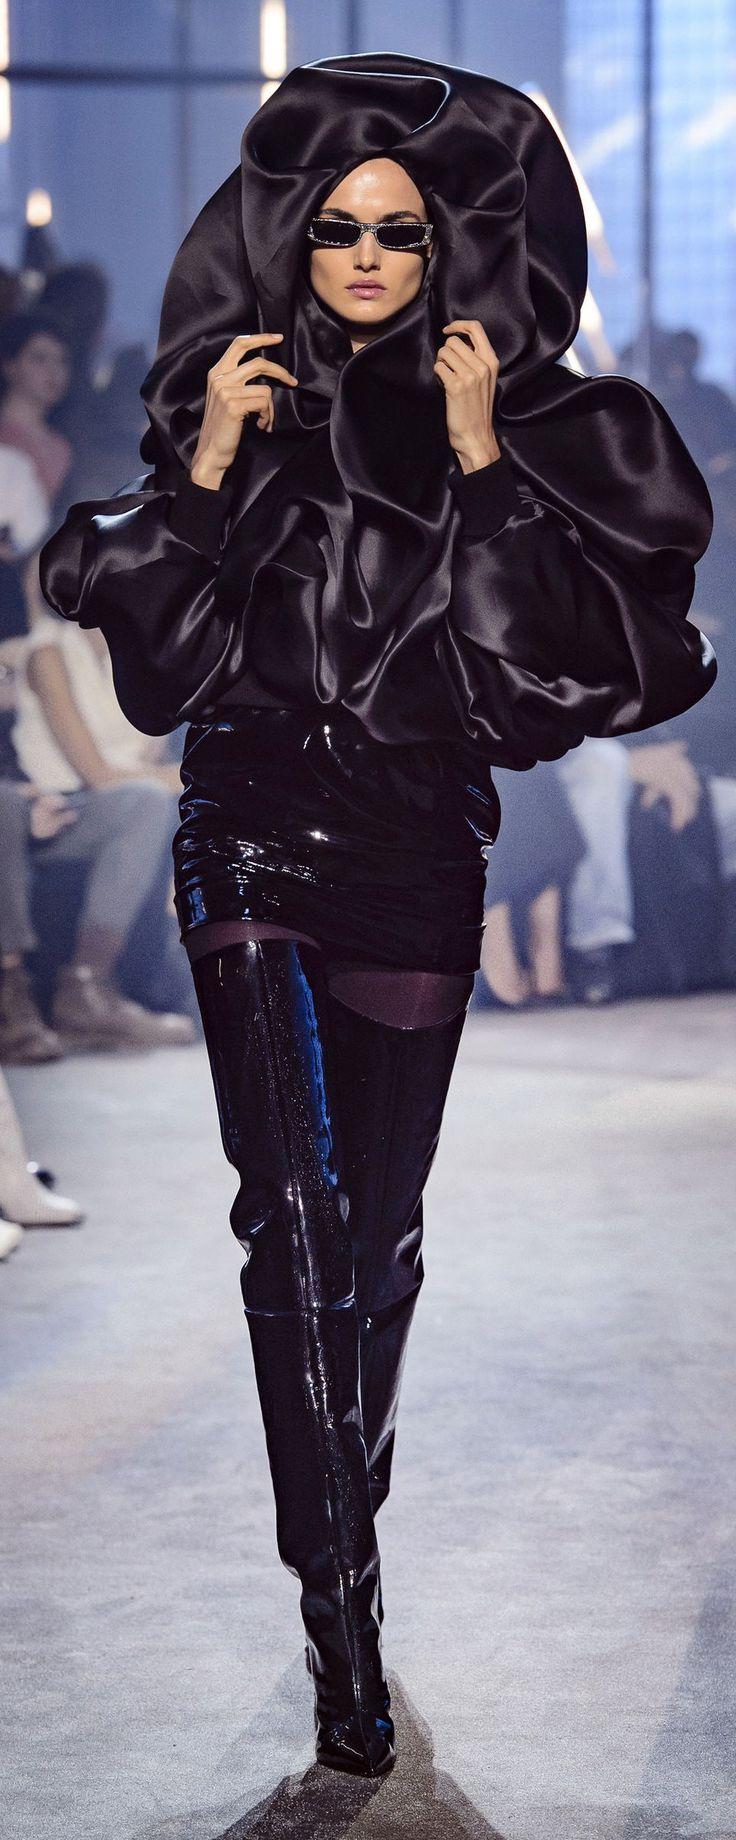 Alexandre Vauthier Spring-summer 2018 - Couture - http://www.orientpalms.com/Alexandre-Vauthier-7031 - ©ImaxTree